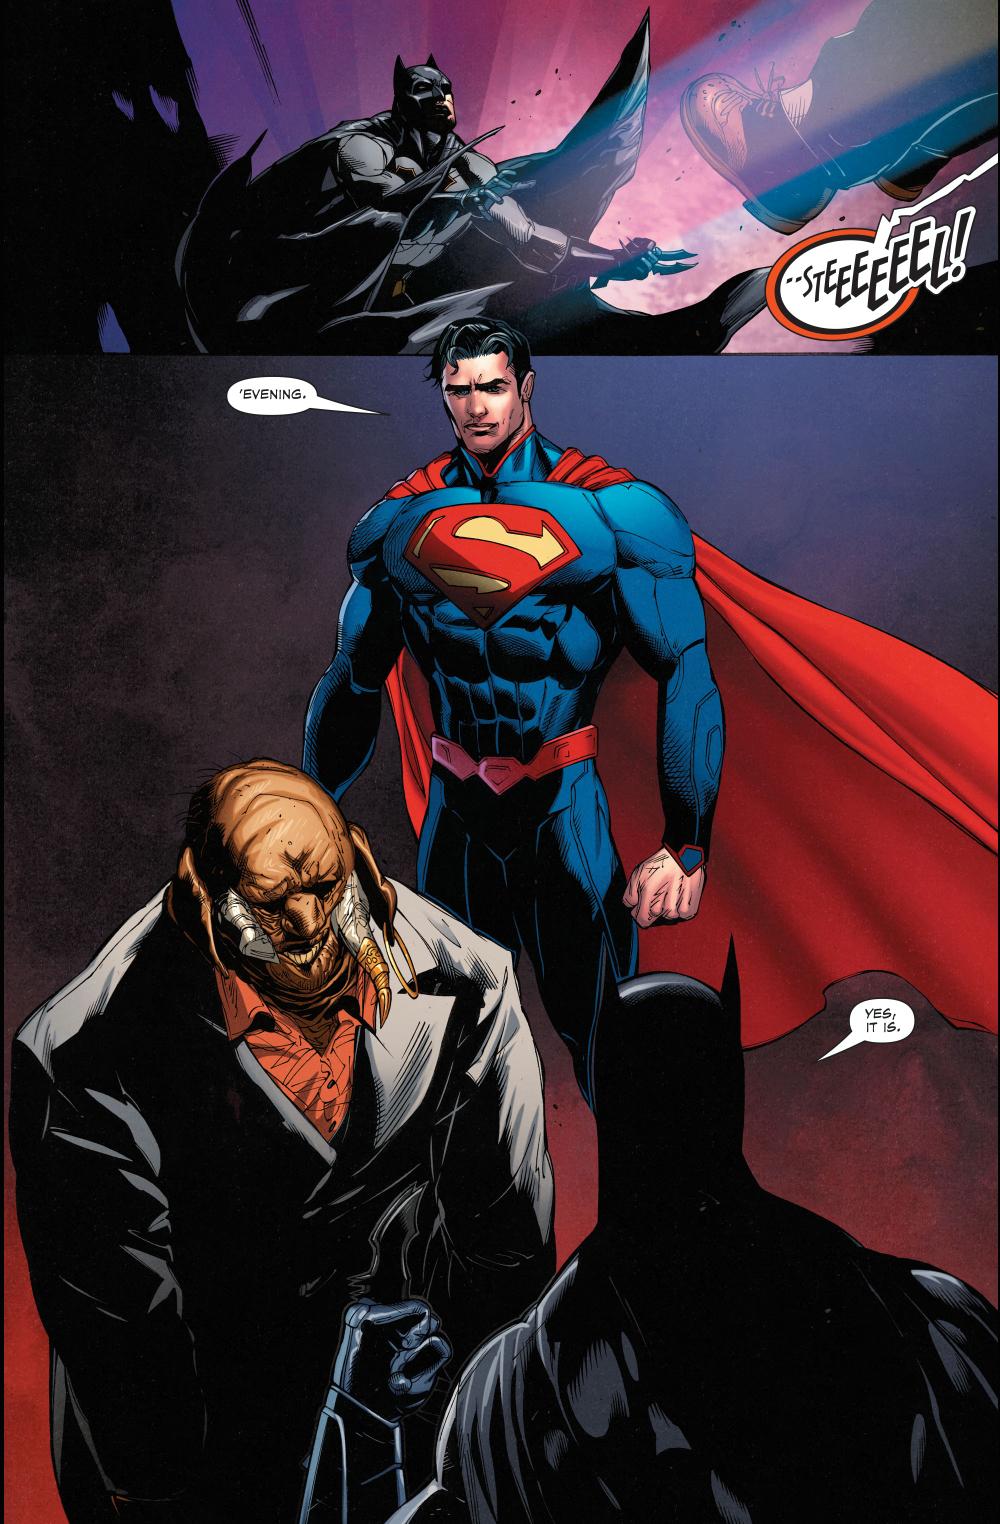 Batman And Superman VS Tusk